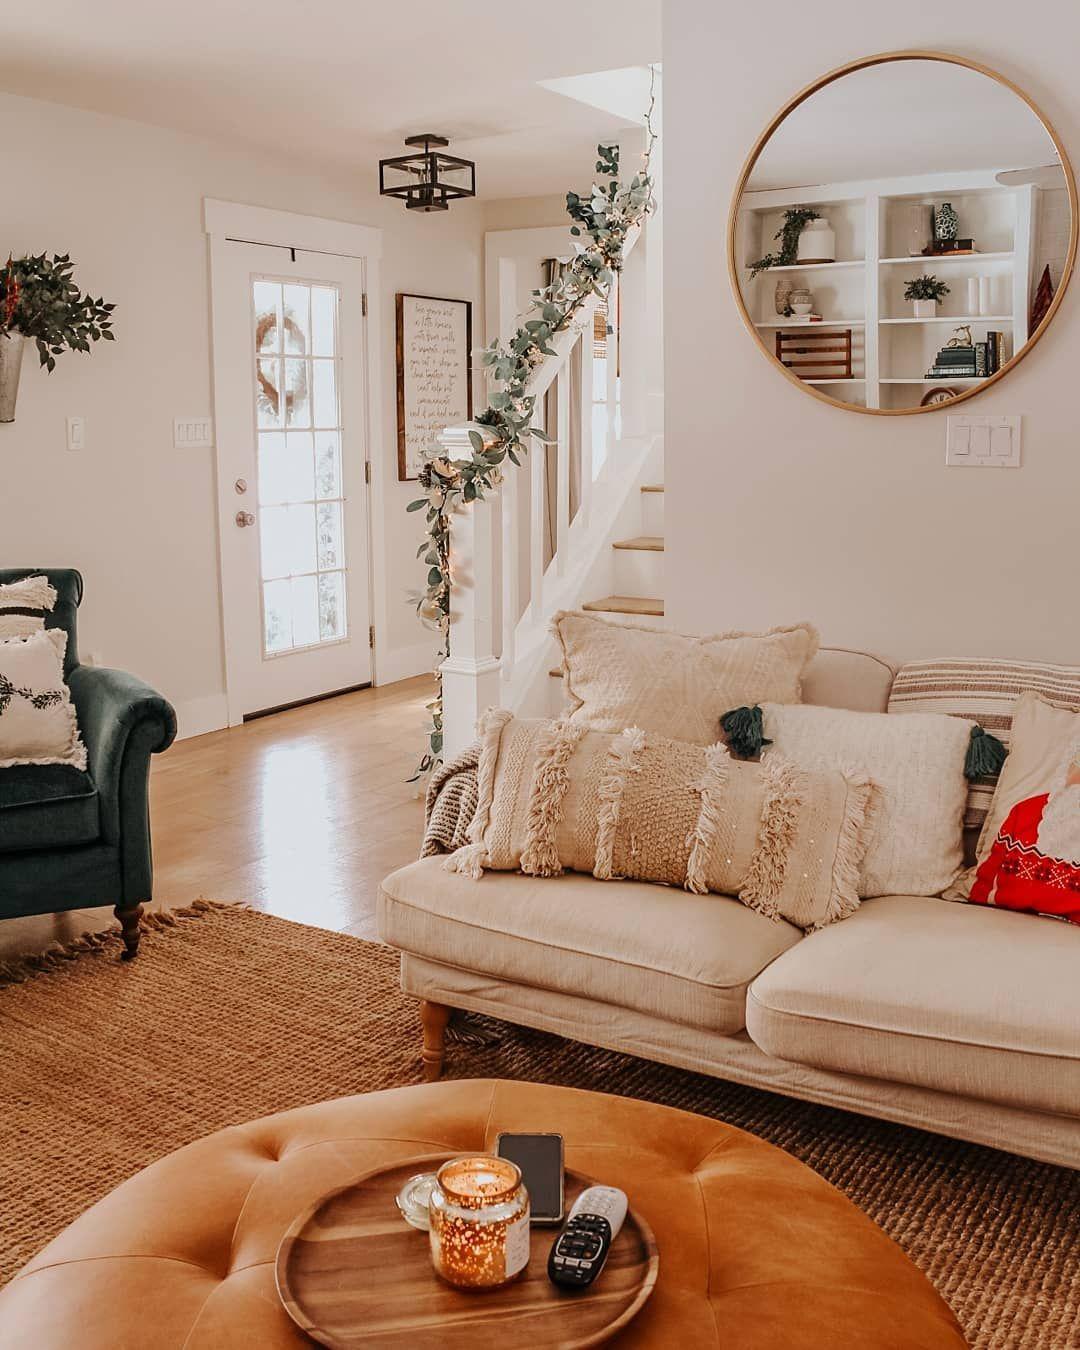 R H I A N N O N L A W S O N Rhiannonlawsonhome Instagram Photos And Videos Home Cozy House Interior Design